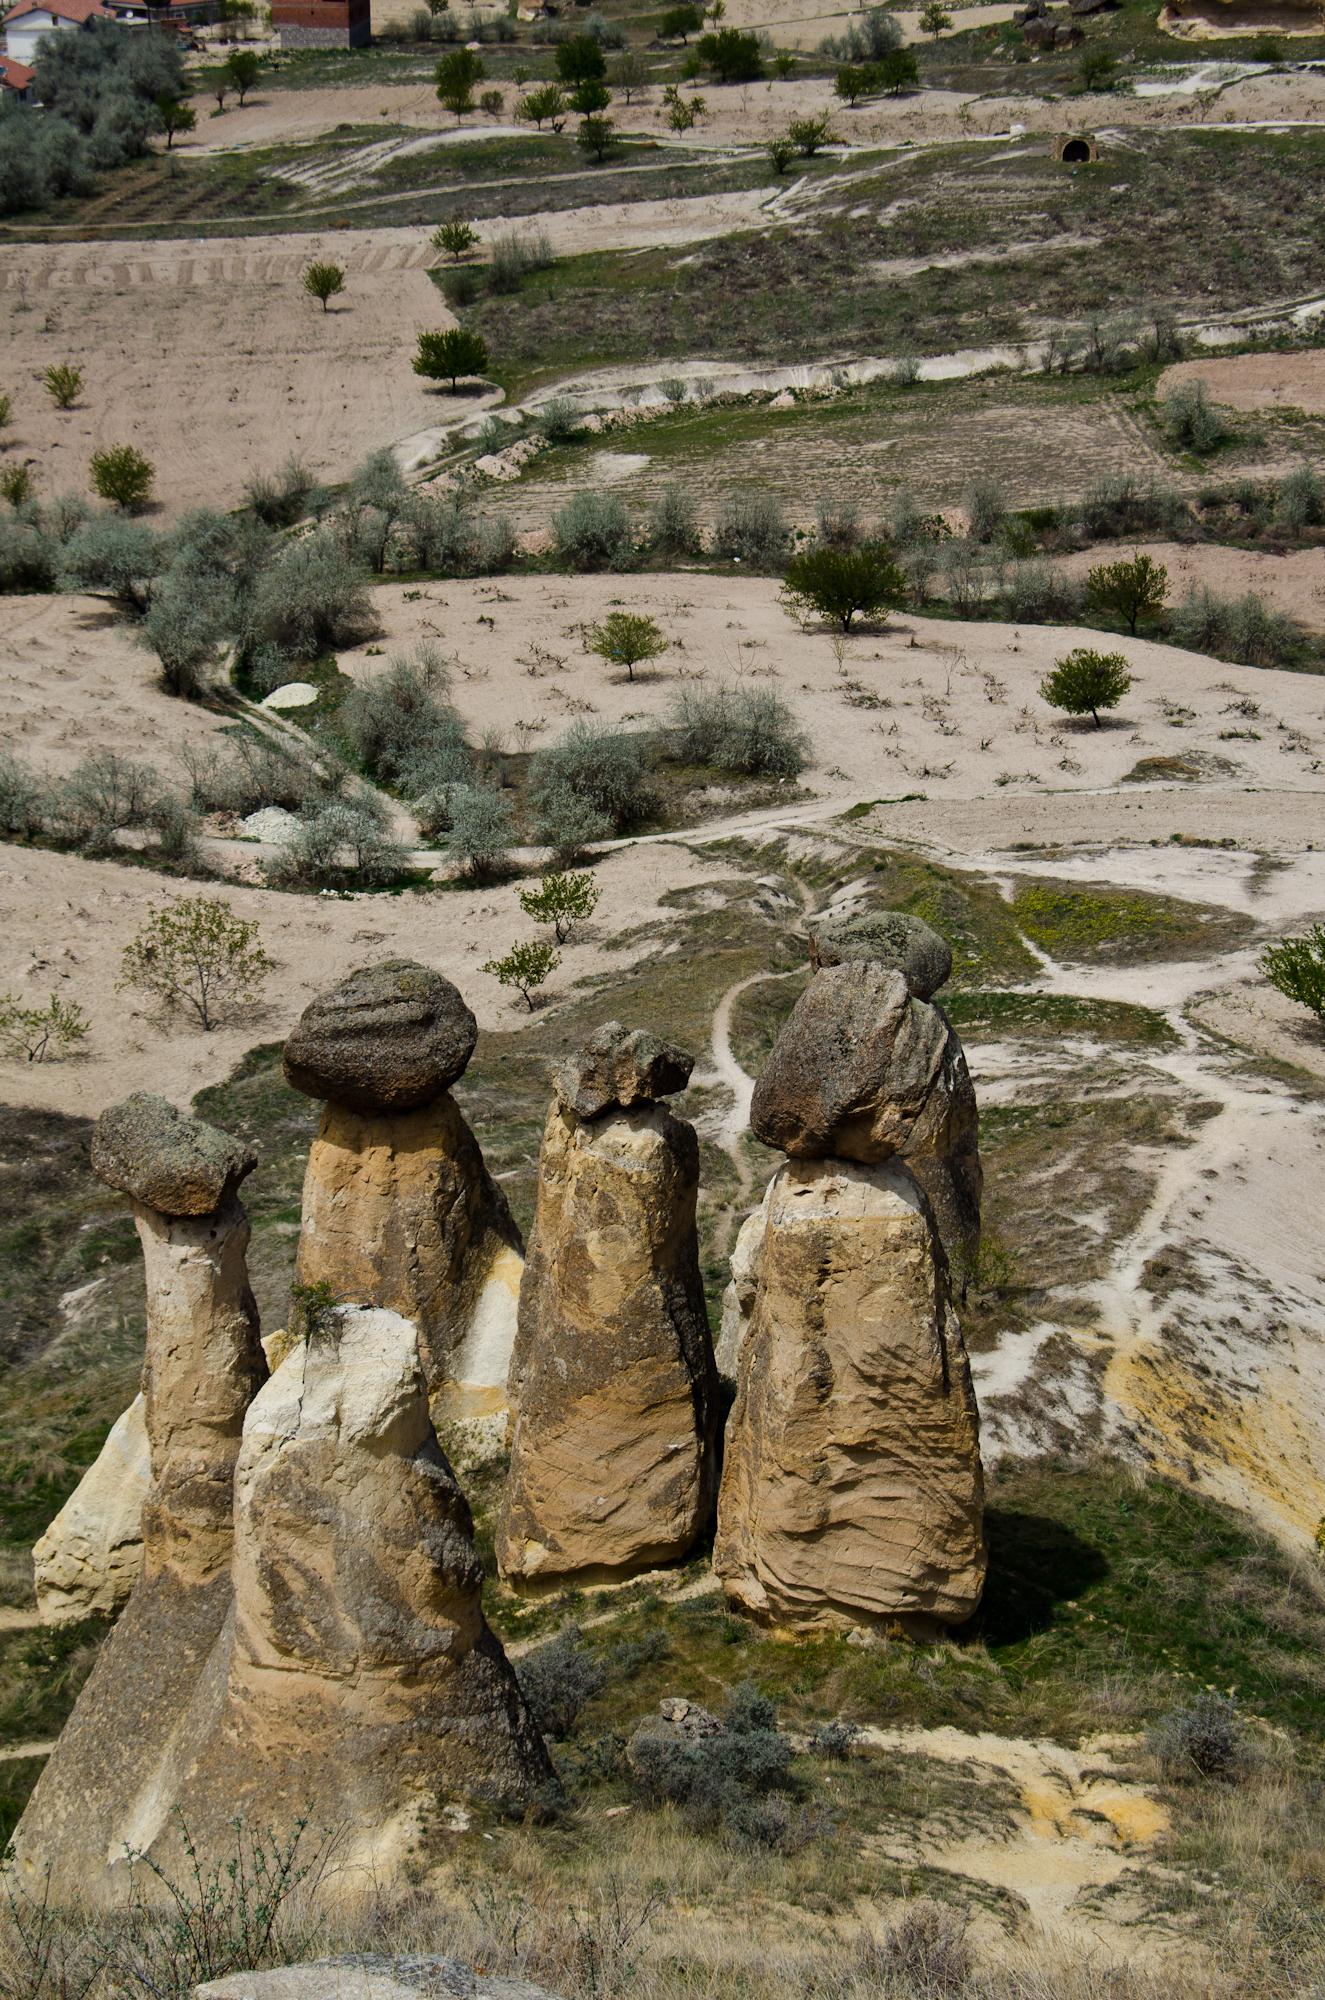 2012-04-27 312 Turul Rosu - Cavusin